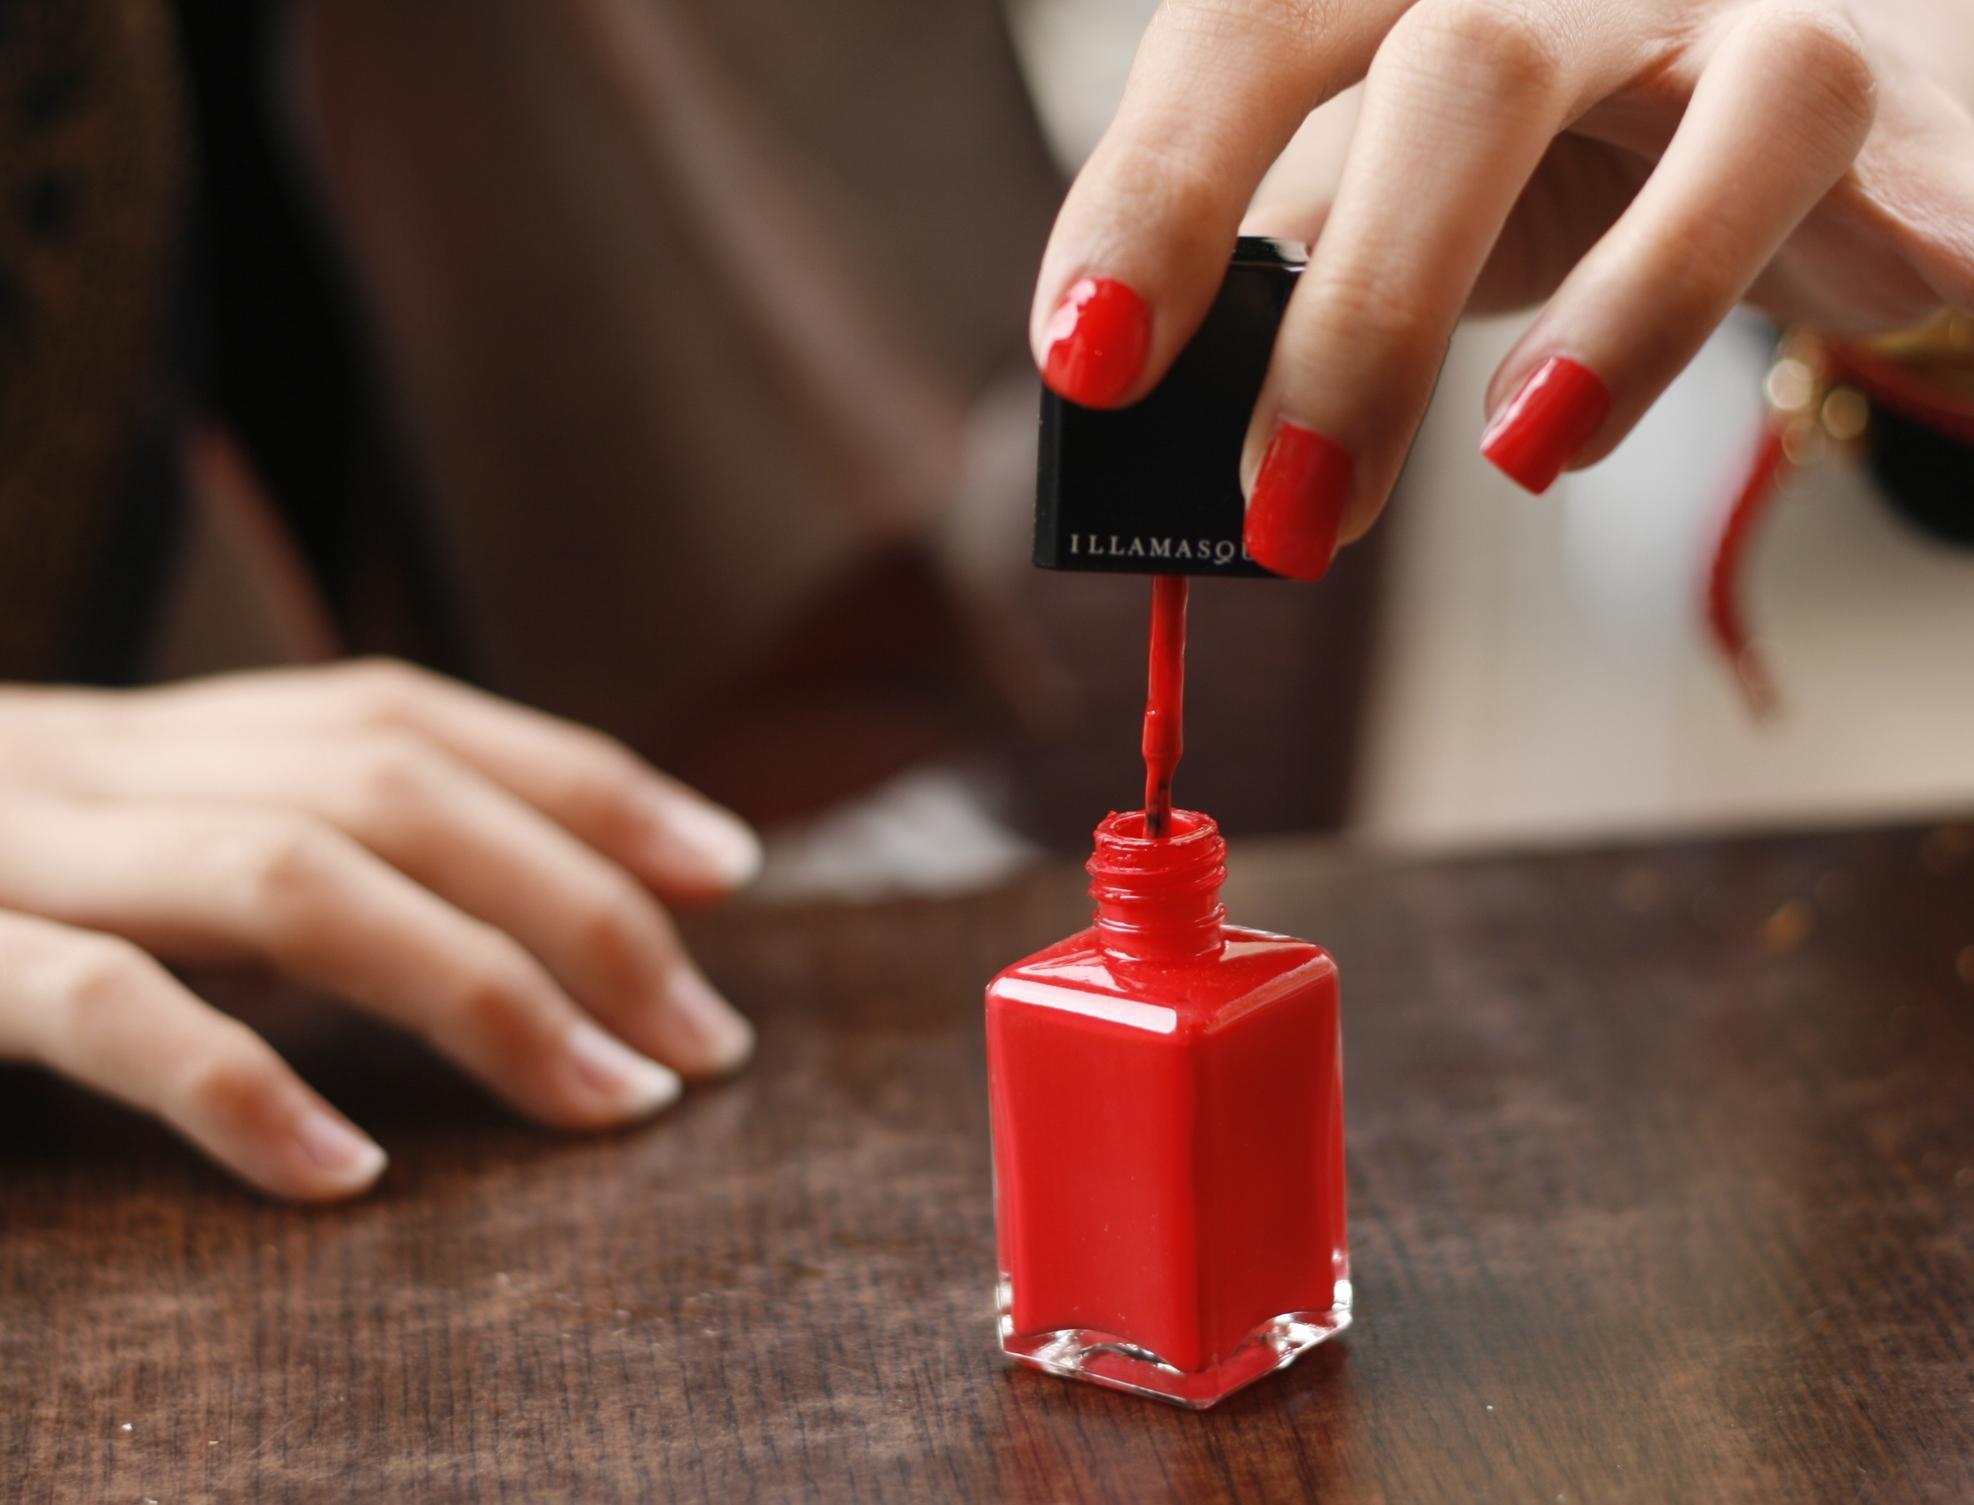 Red_nail_polish_in_application.jpg